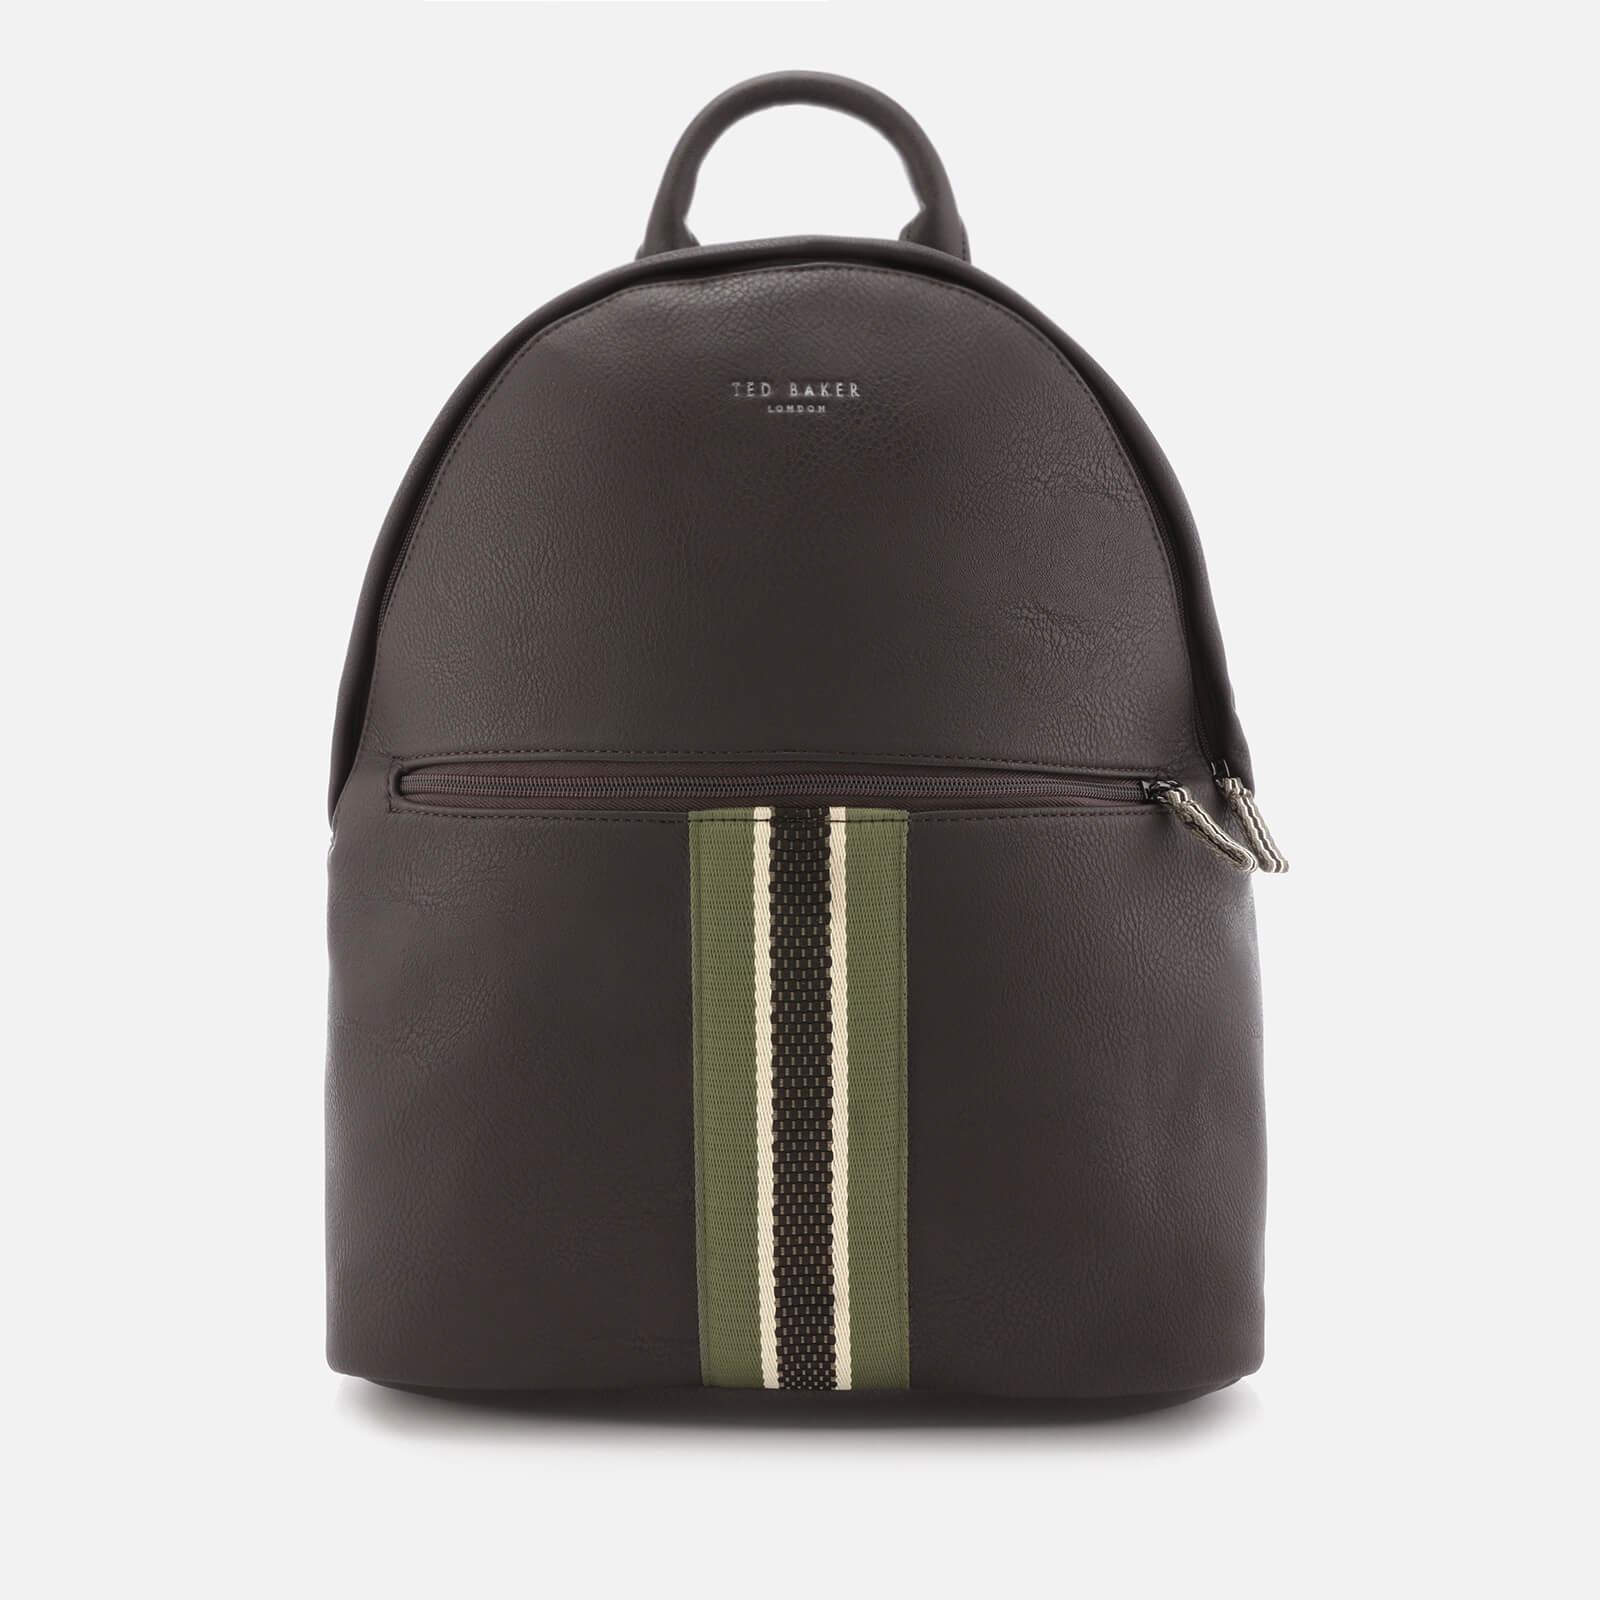 8e0f9dbda Ted Baker Men s Standin Webbing Backpack - Chocolate Mens Accessories